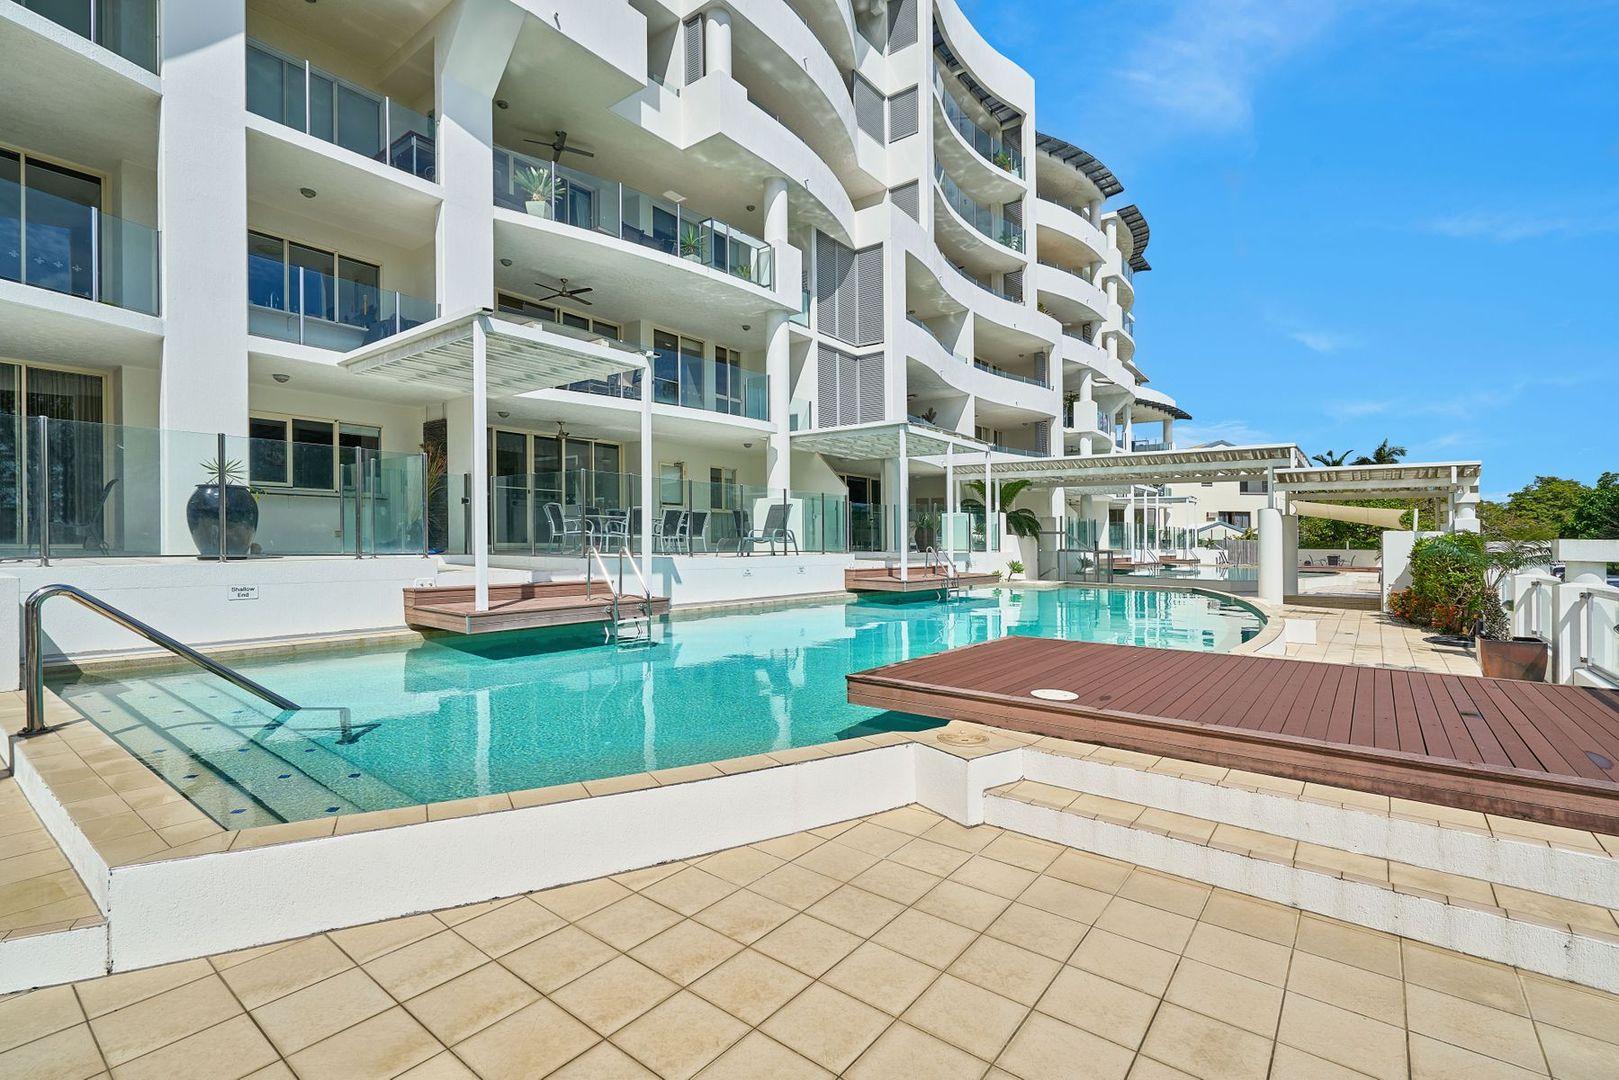 13/155-159 Esplanade, Cairns City QLD 4870, Image 0